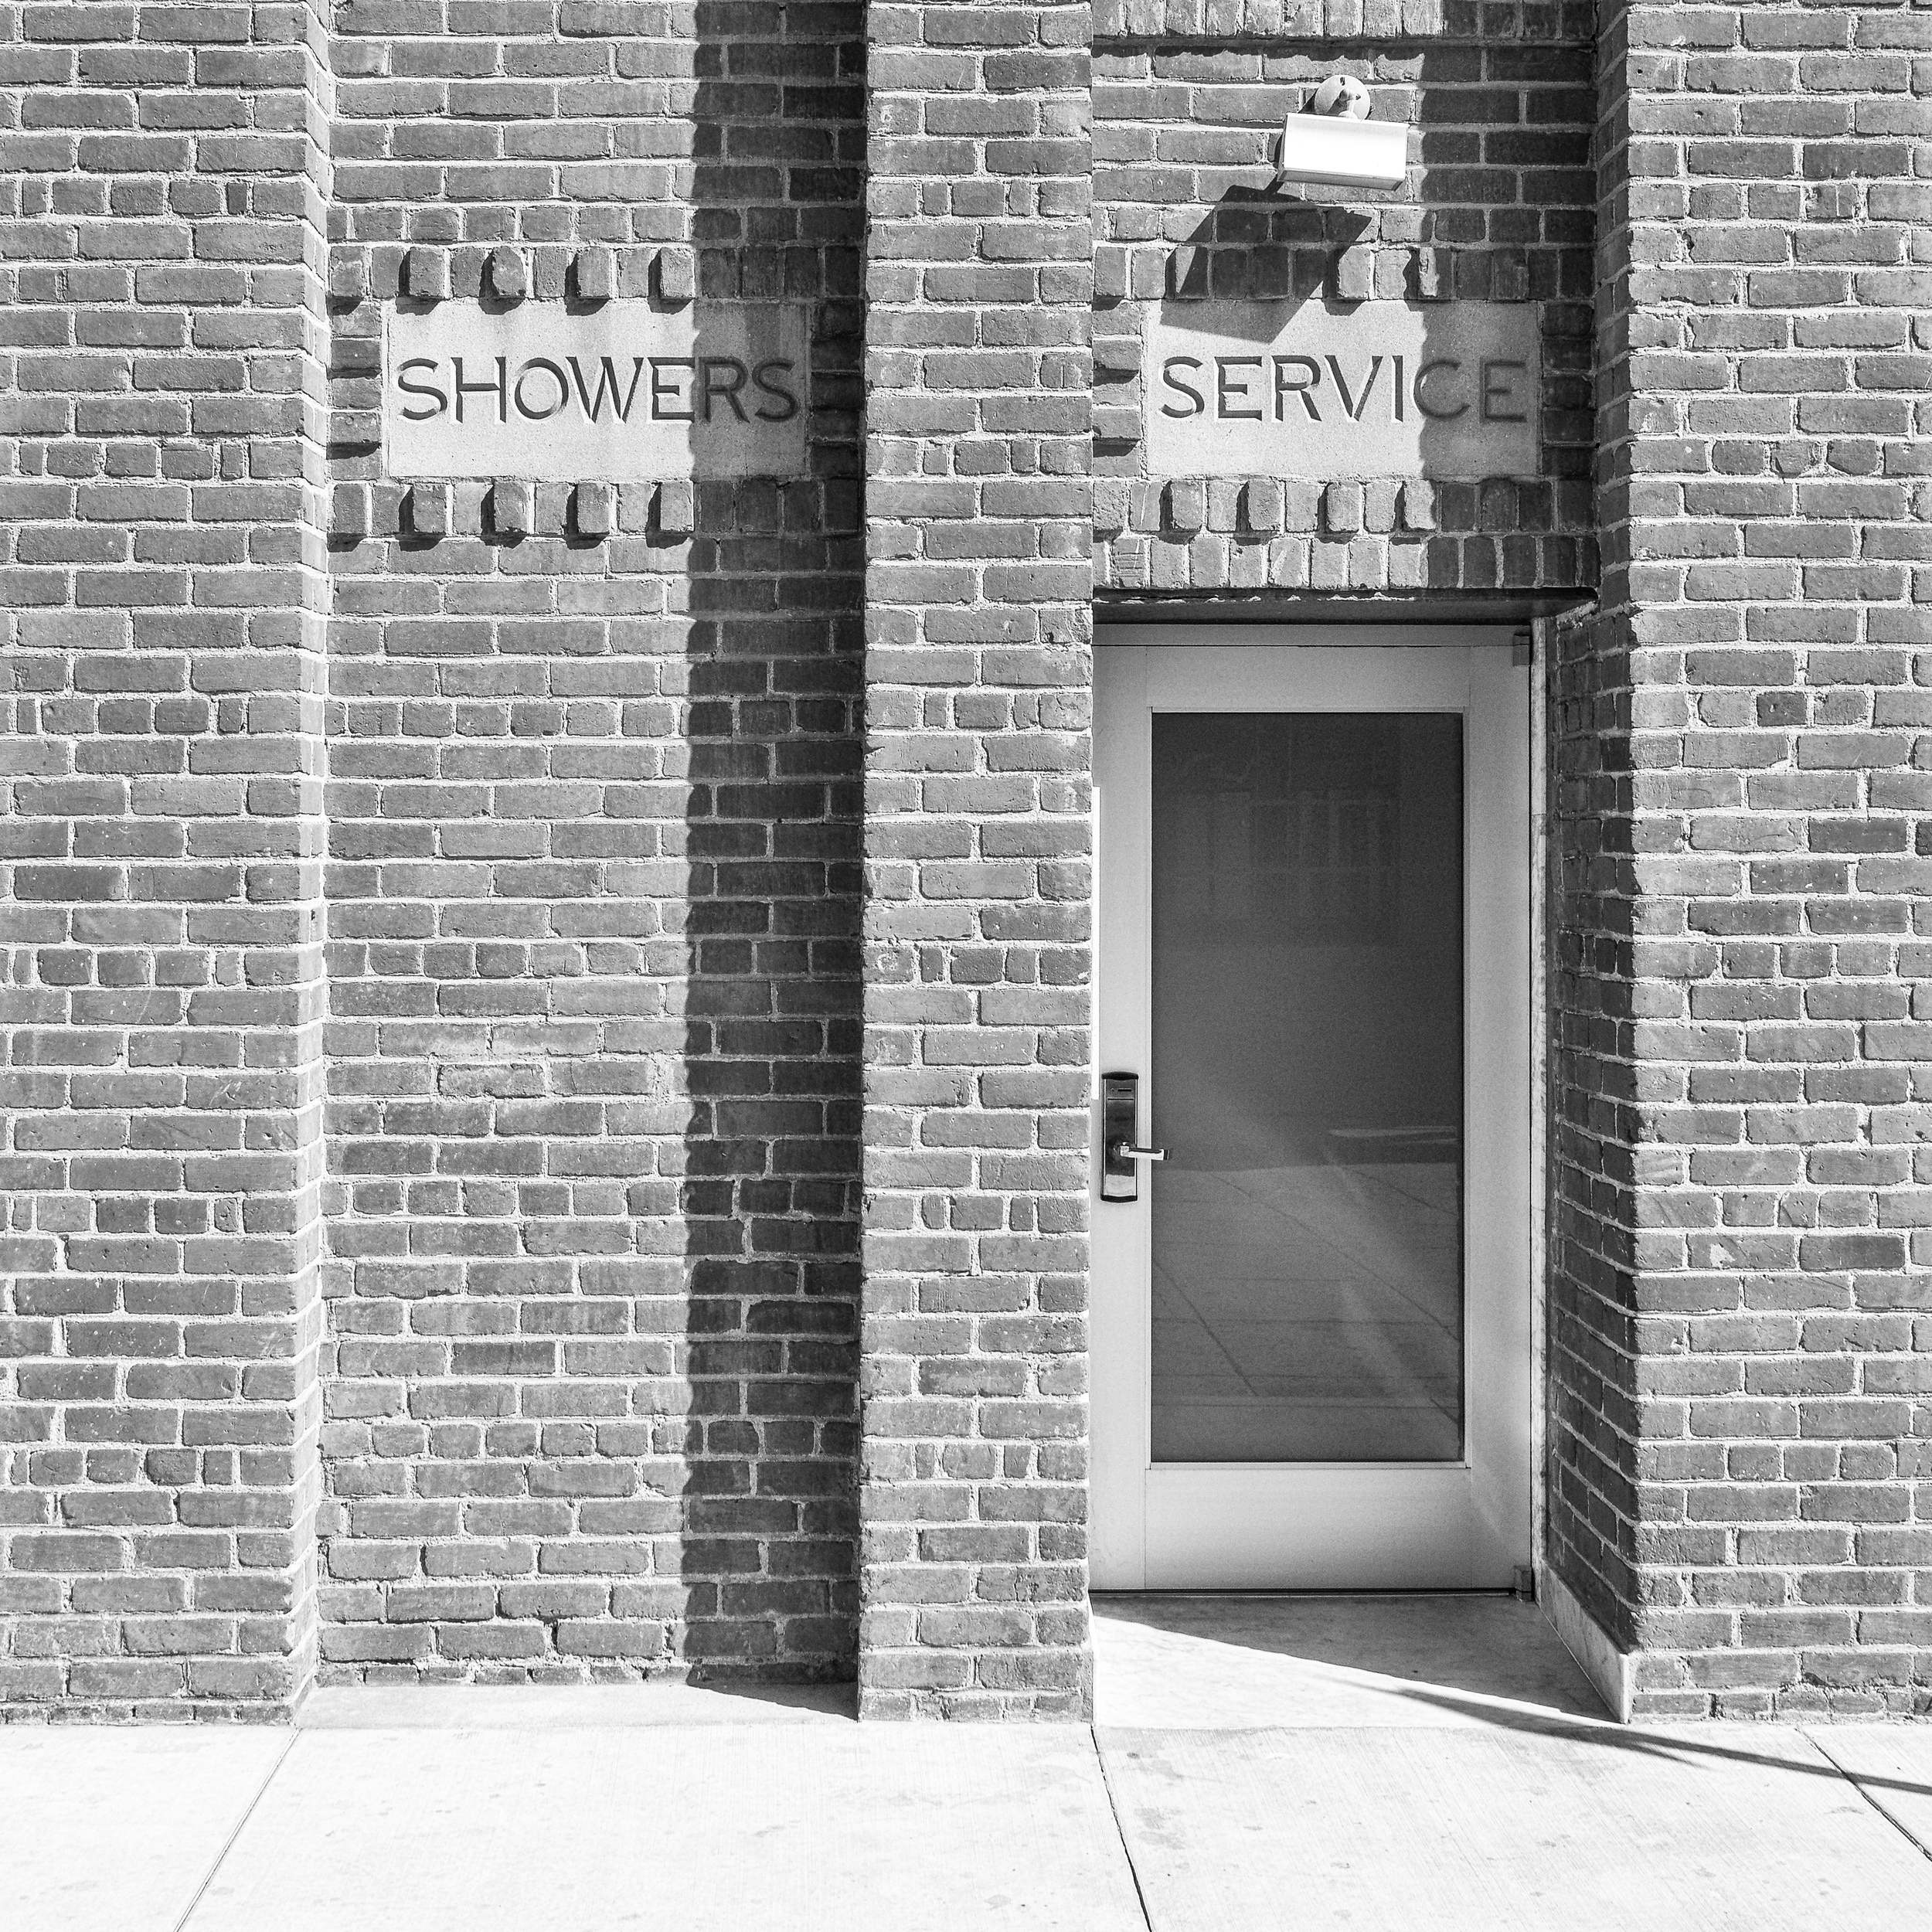 No Showers, Service